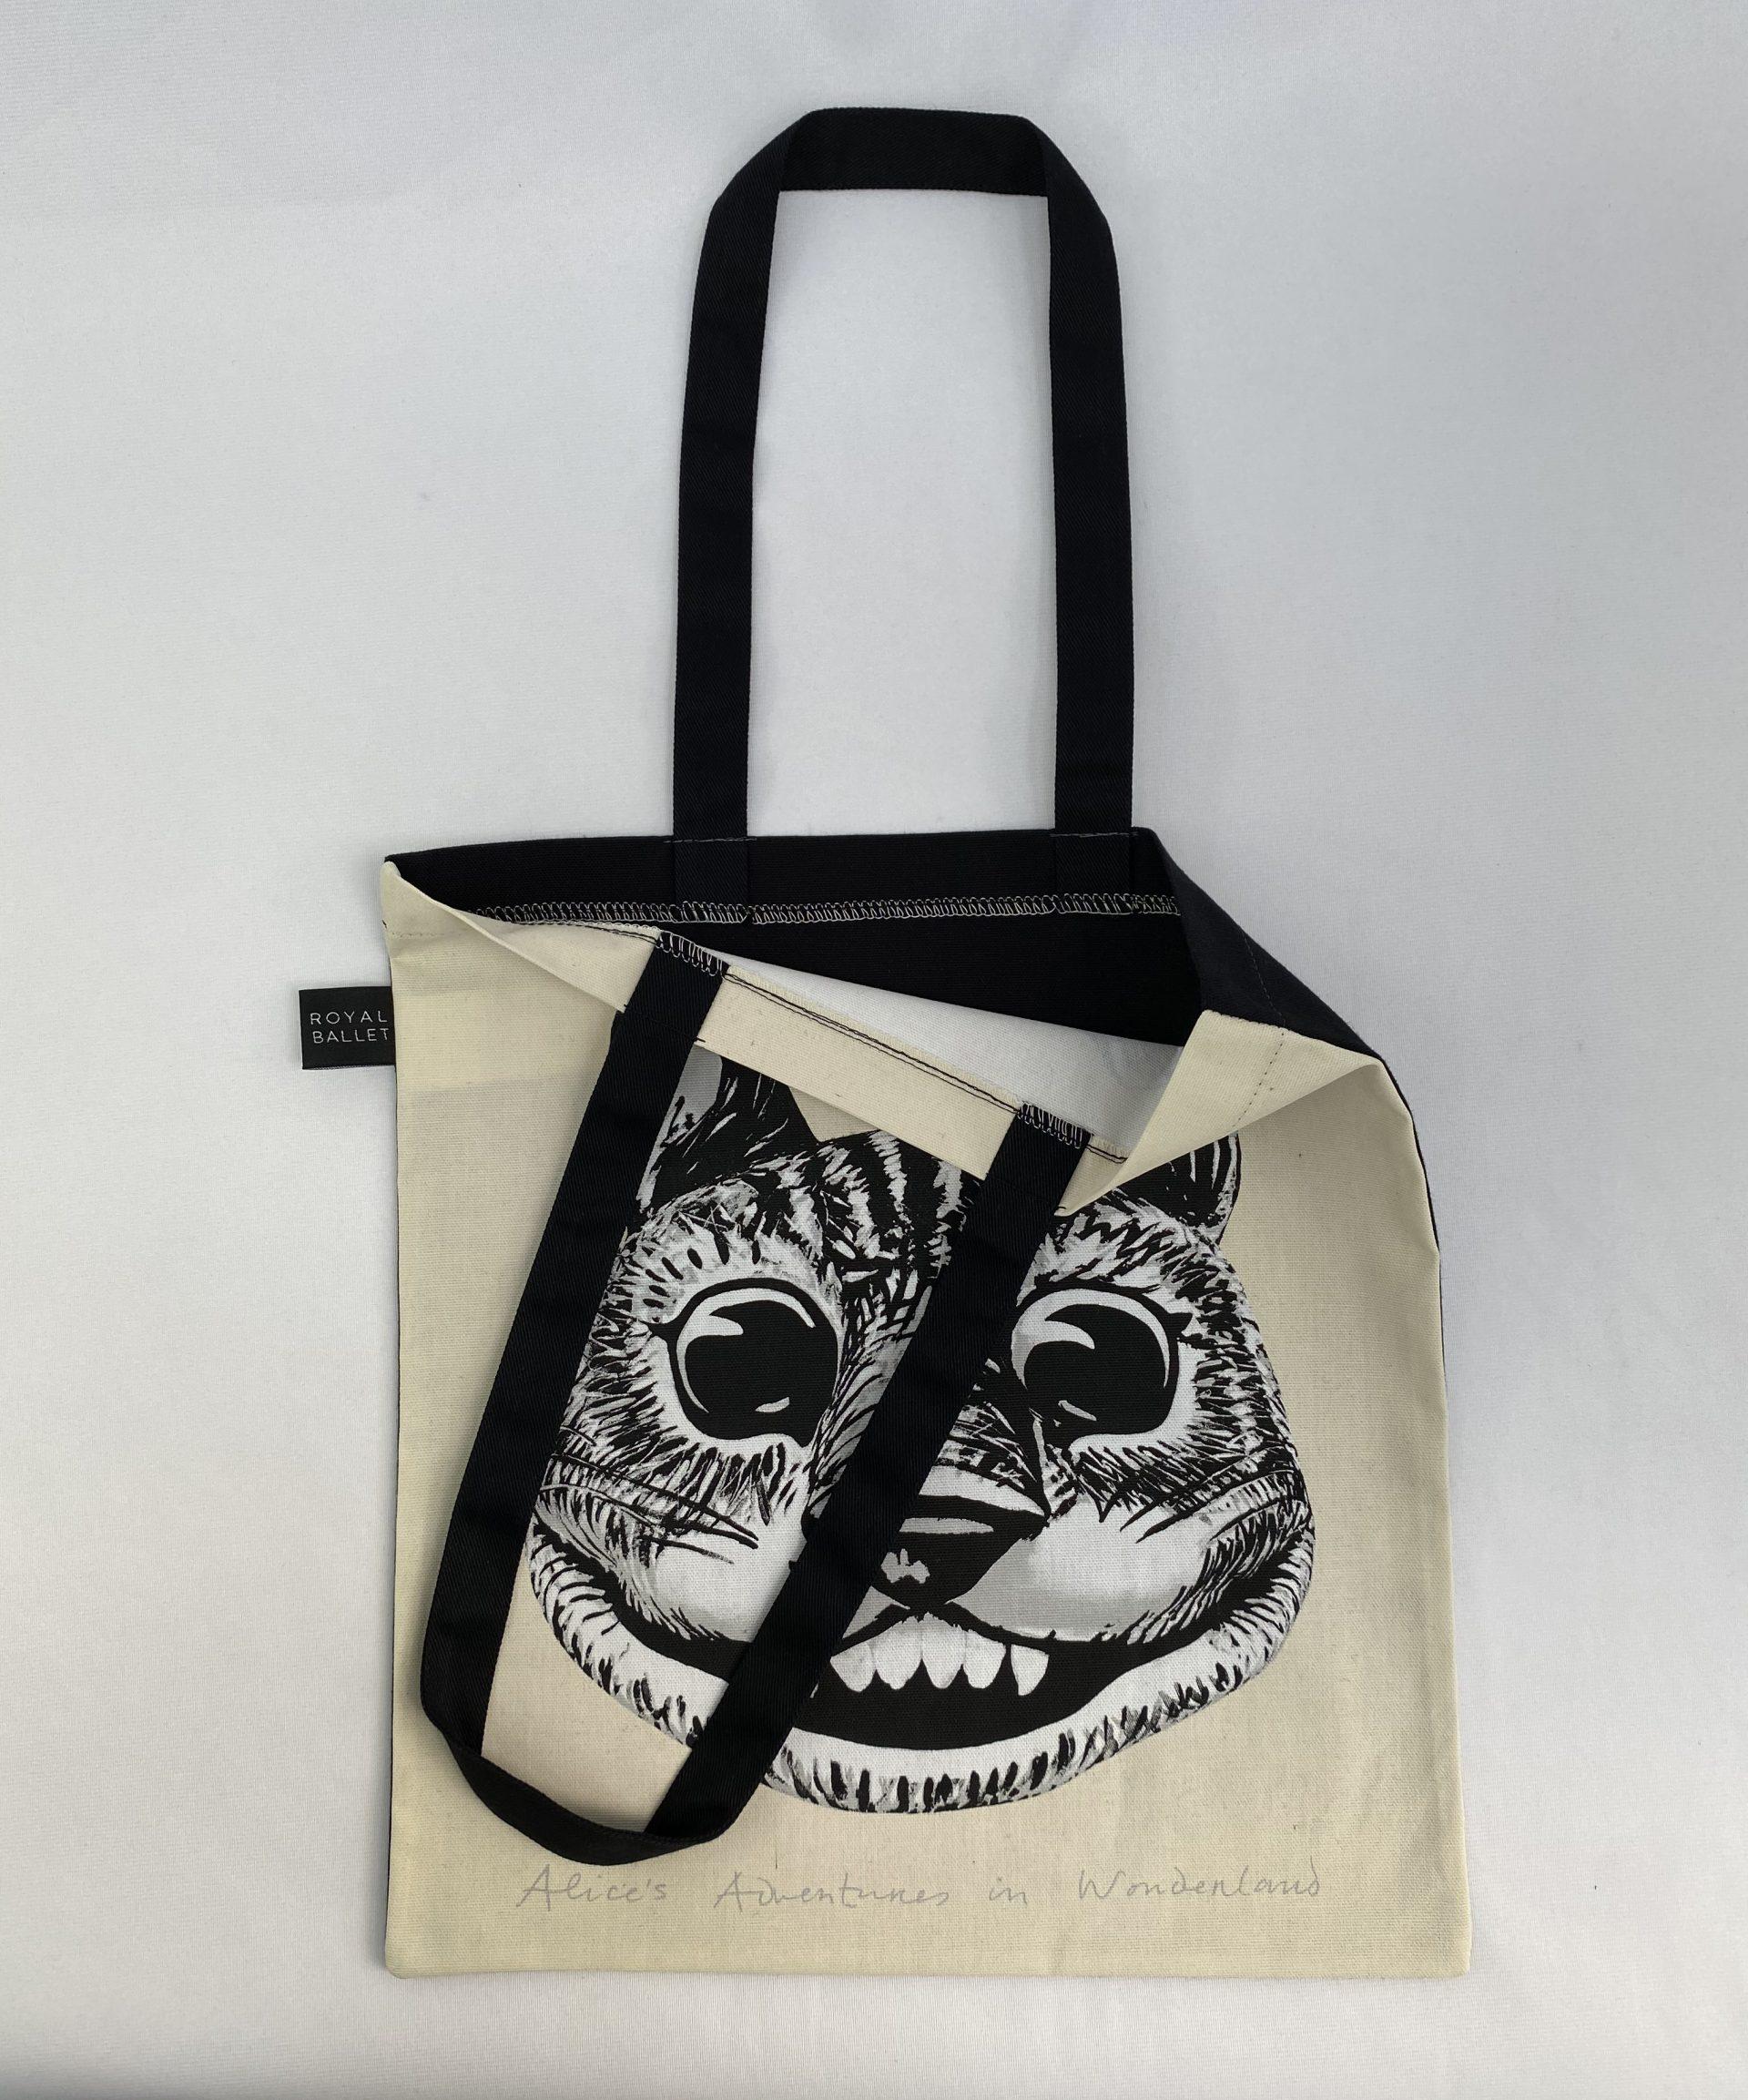 Royal Ballet organic tote bag